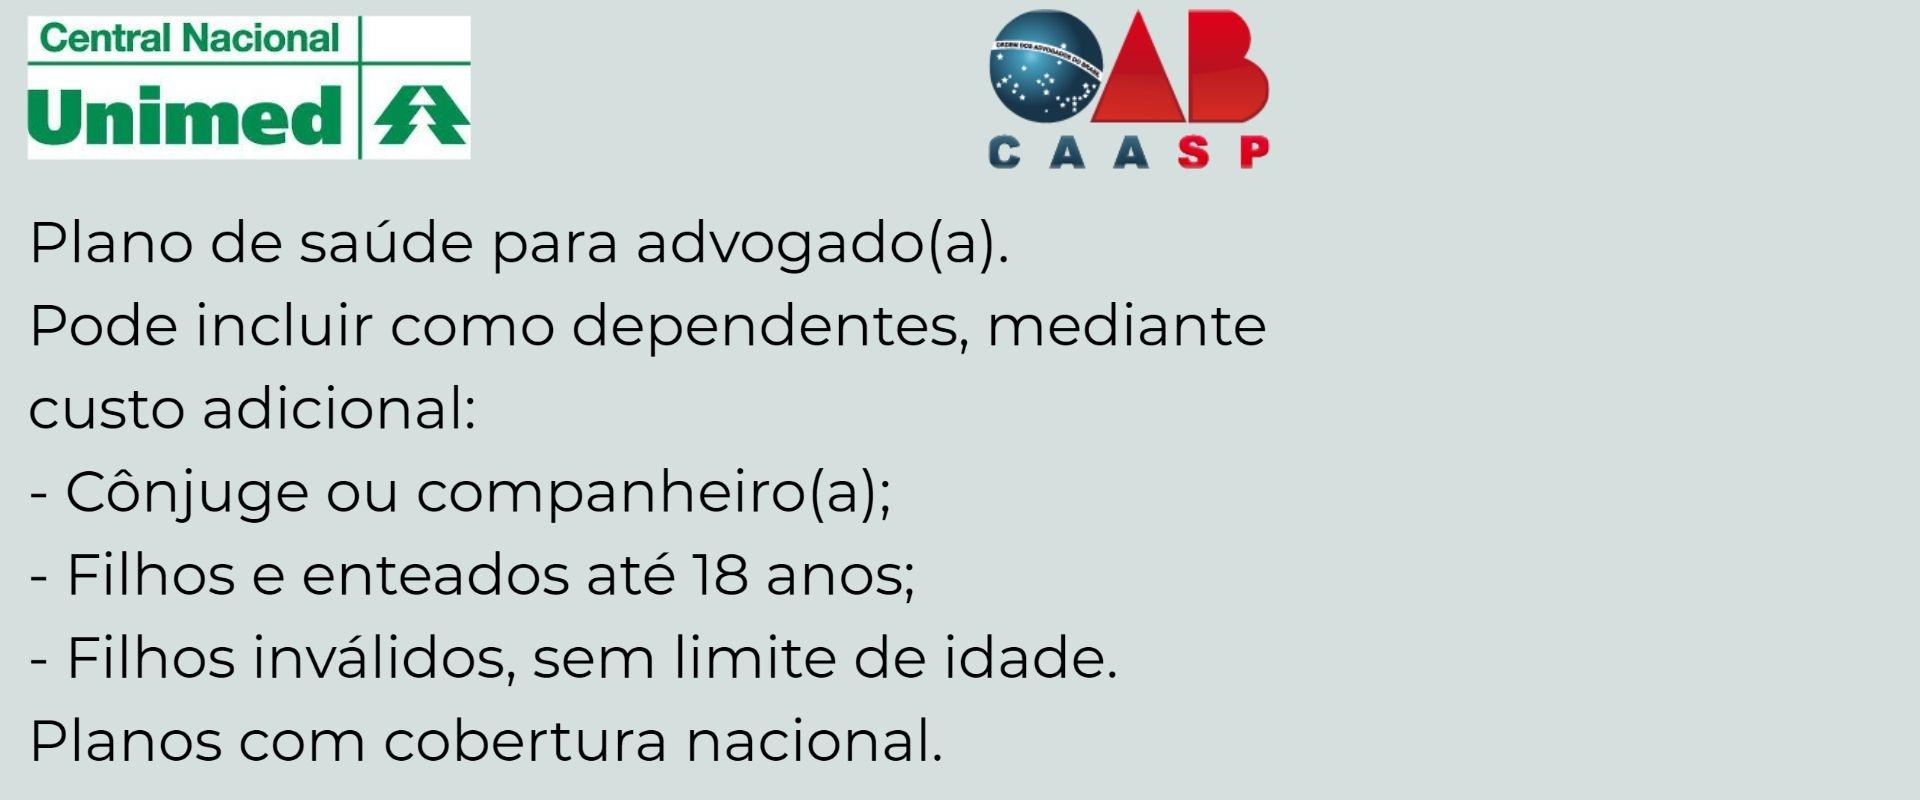 Unimed CAASP Salto